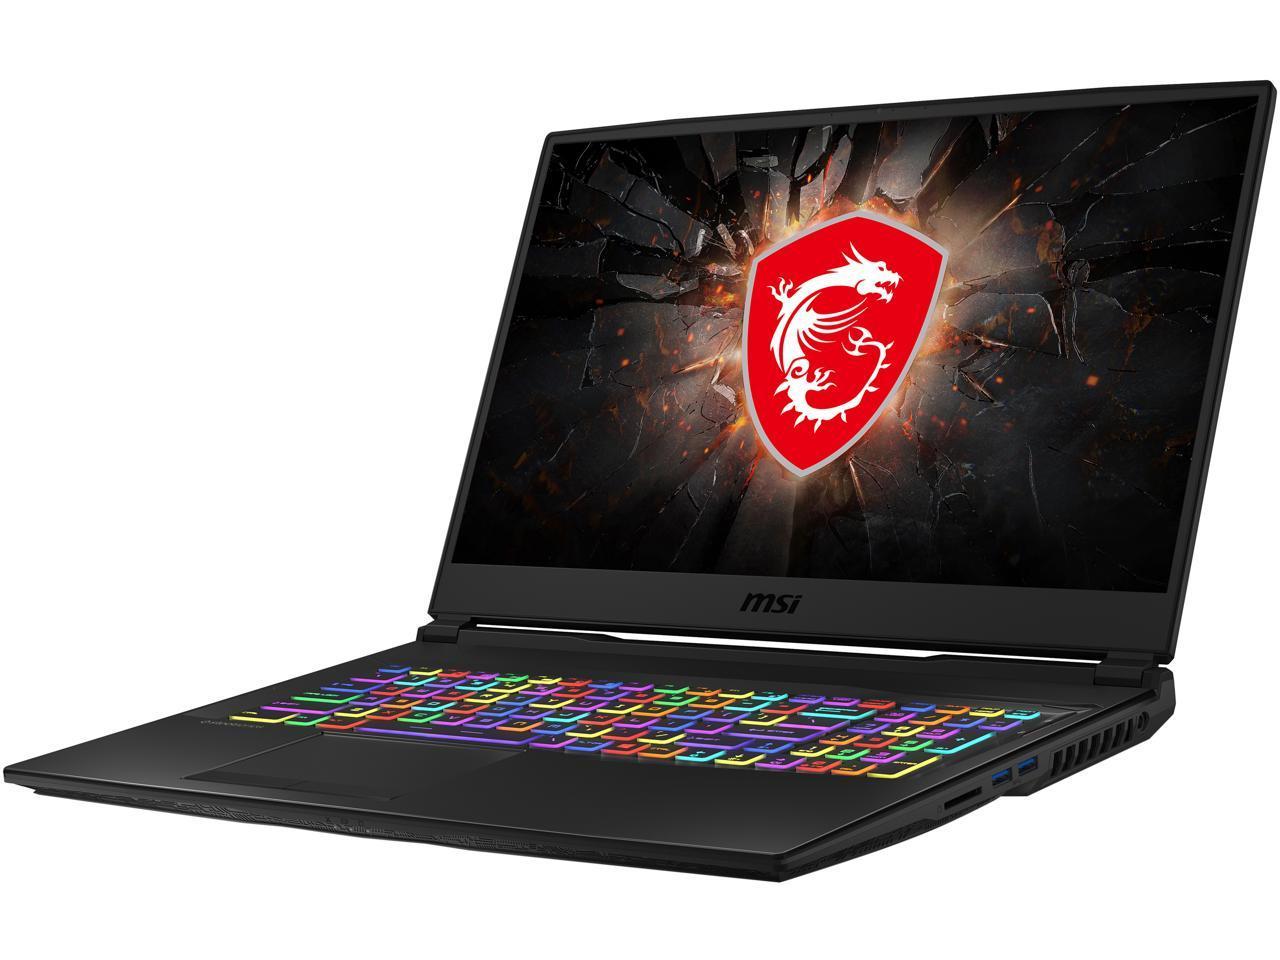 Newegg: MSI GL75 Leopard Gaming Laptop @ 99.00 + Free Shipping